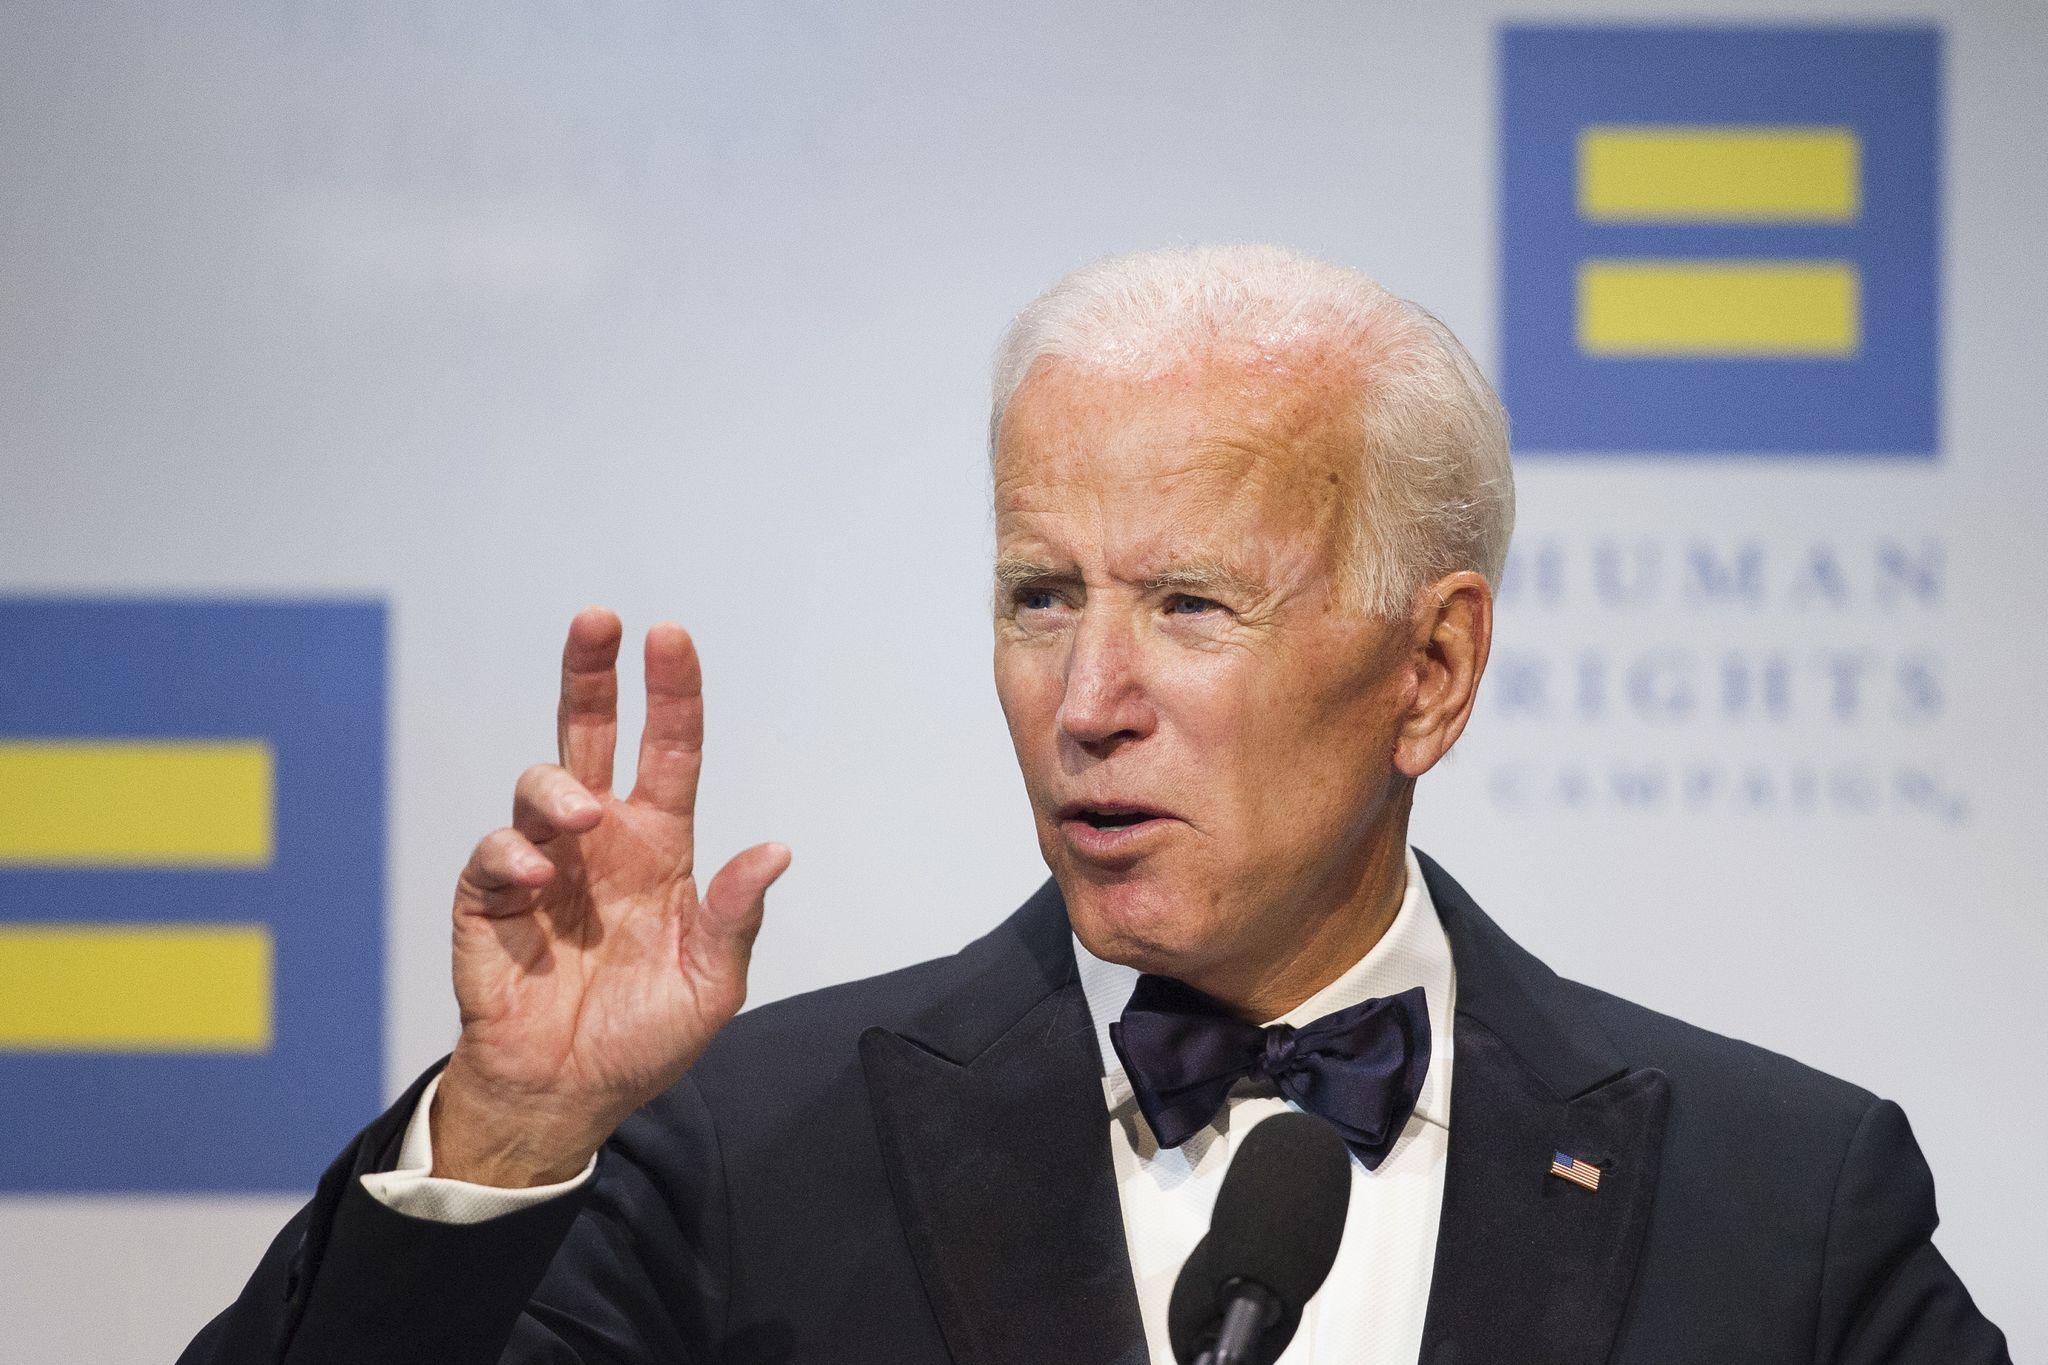 Joe Biden: 'Dregs of society' support Donald Trump